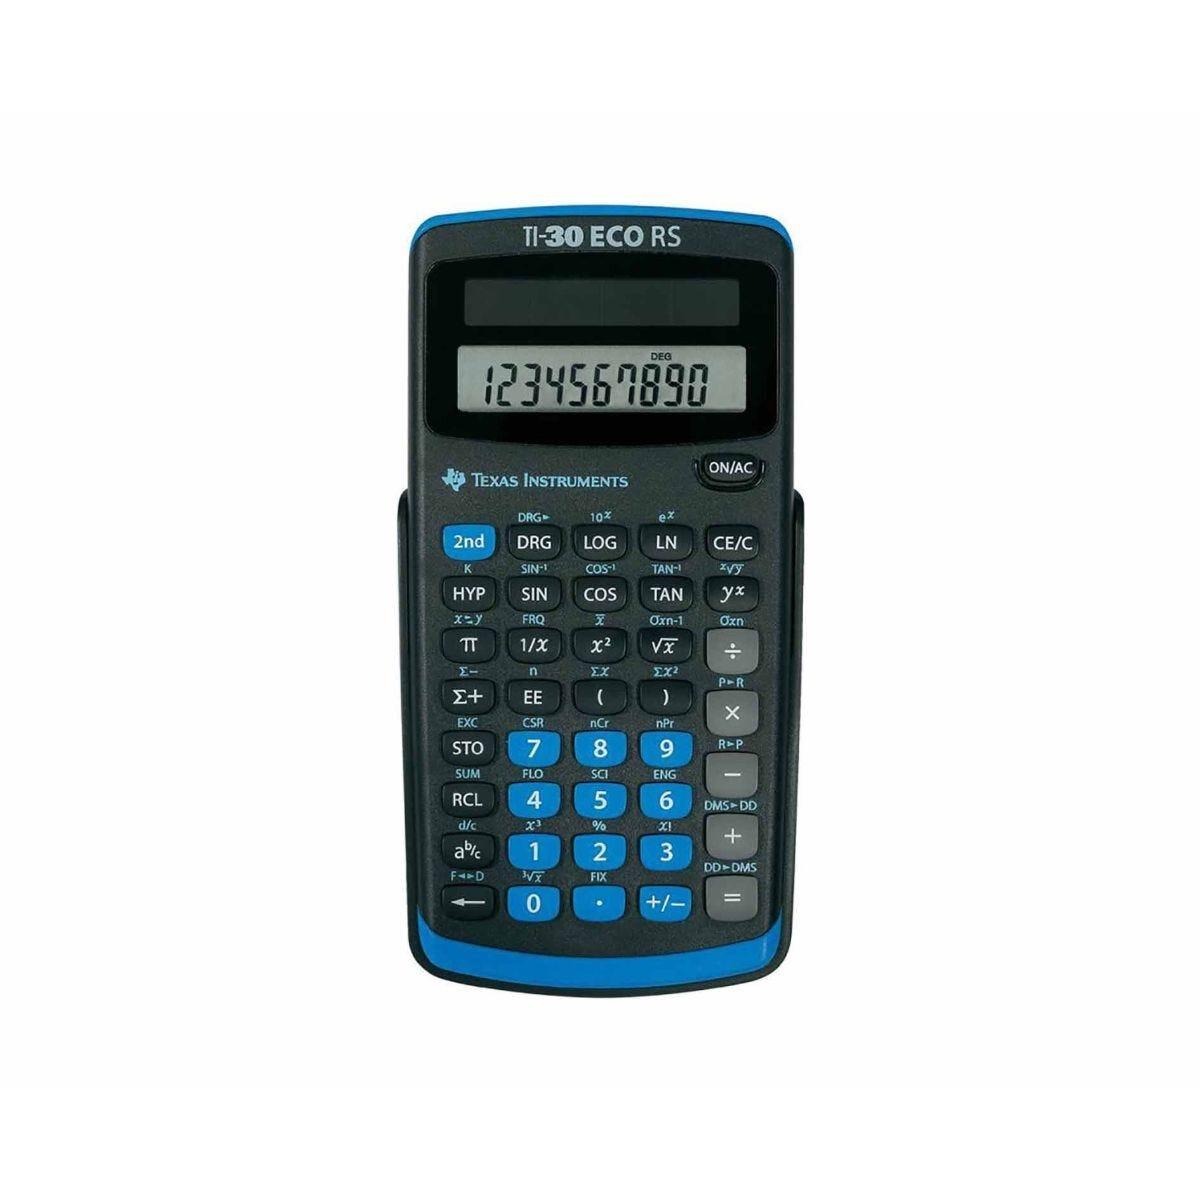 Texas Instruments TI-30 ECO RS Calculator